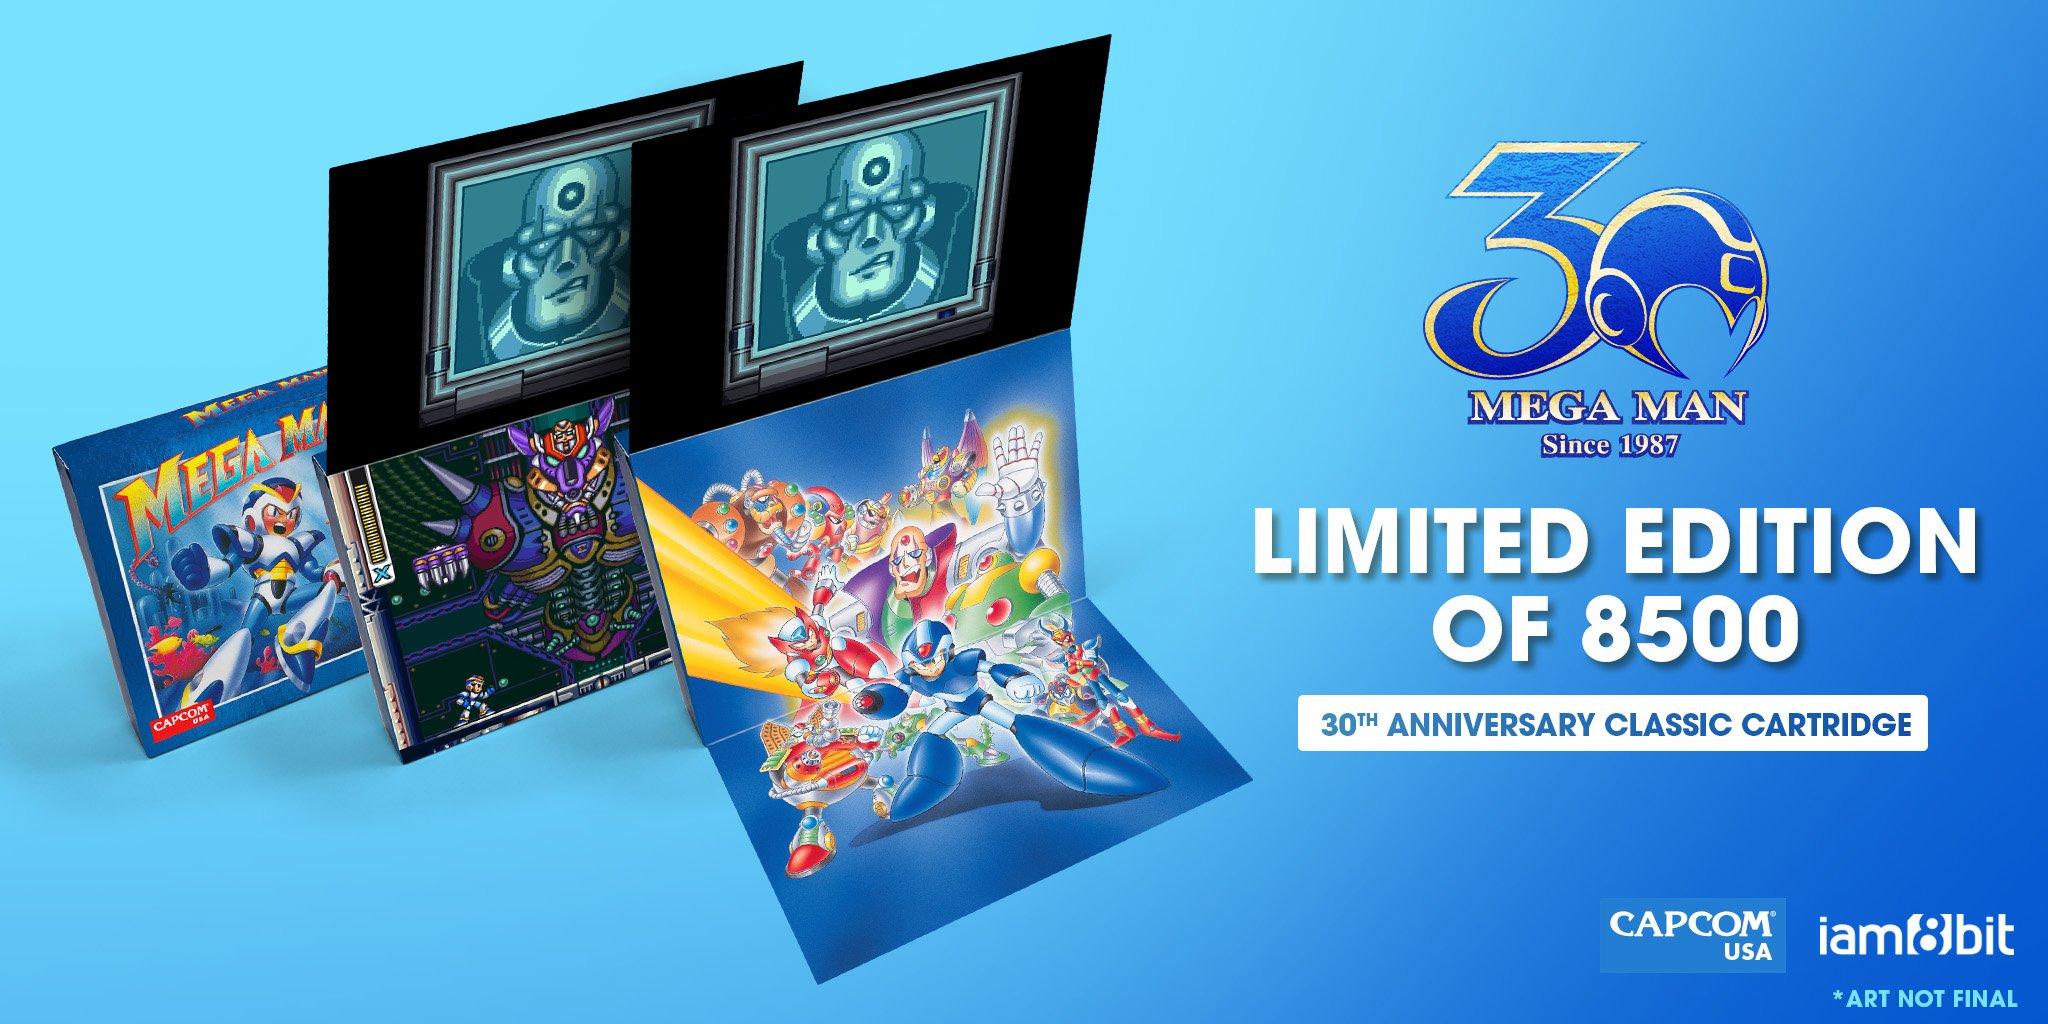 05-Mega Man 2-30th Anniversary Classic Cartridge 41d2f5b5-5561-41d6-aceb-9612b94324e3